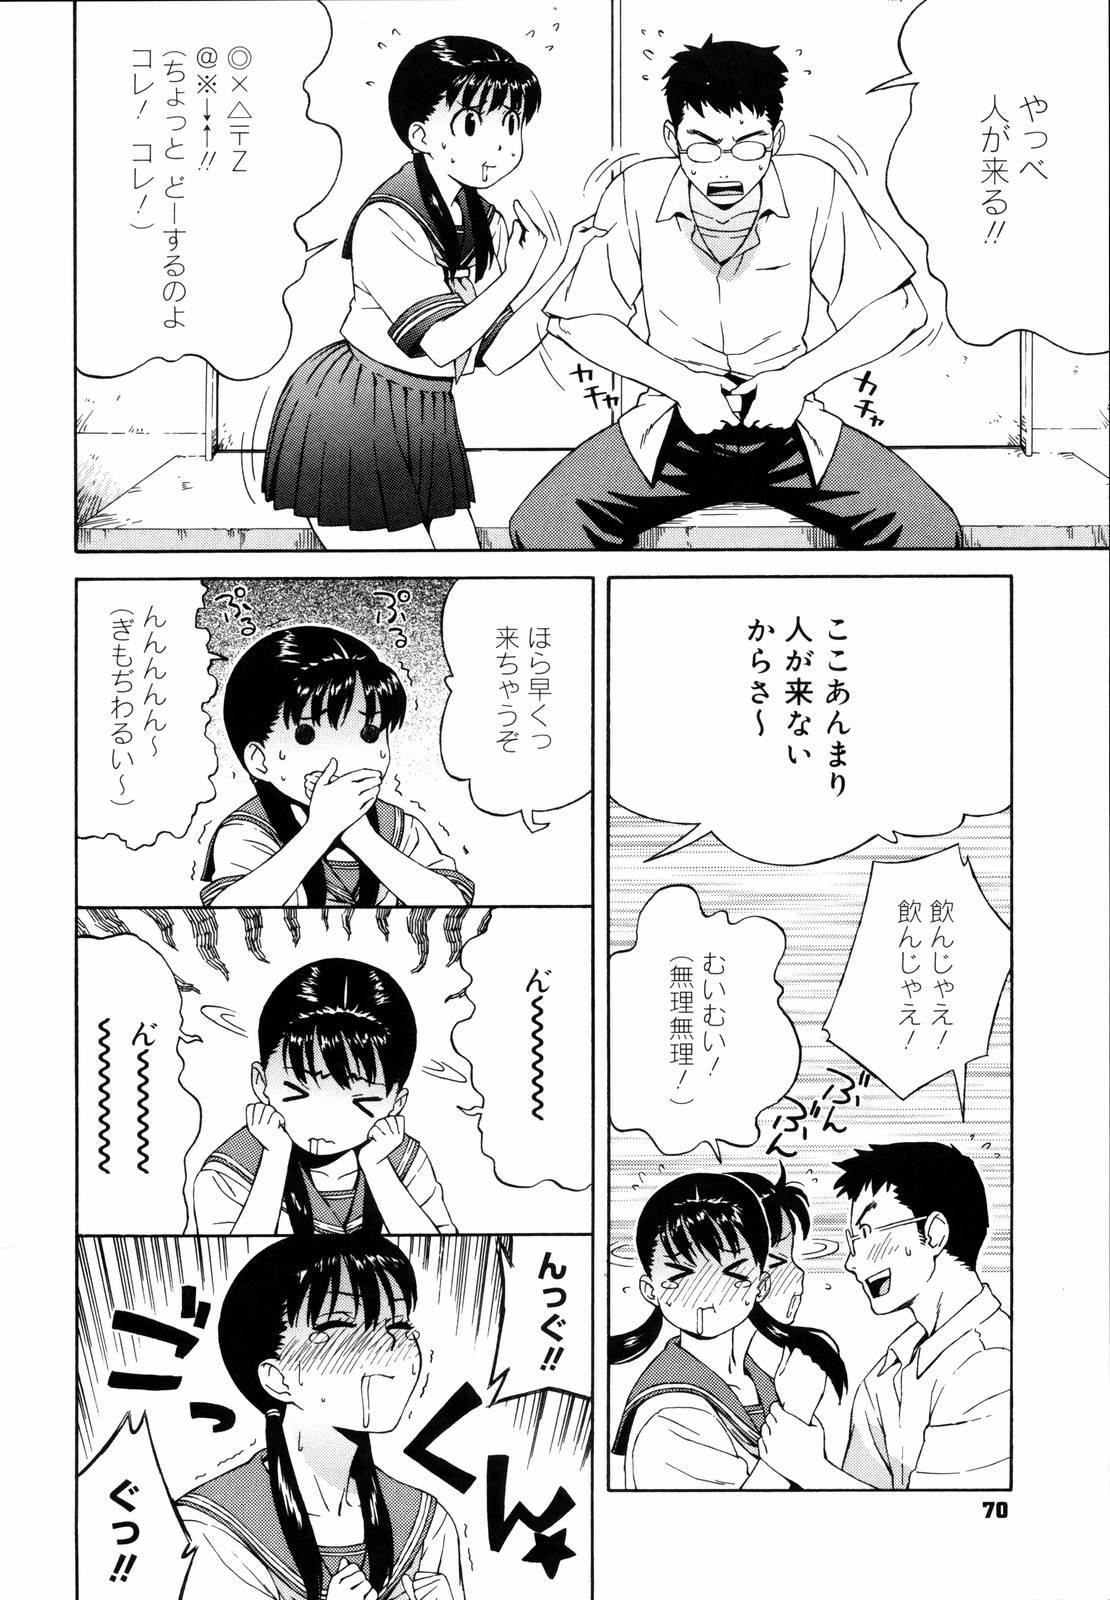 Shishunki wa Hatsujouki - Adolescence is a sexual excitement period. 71